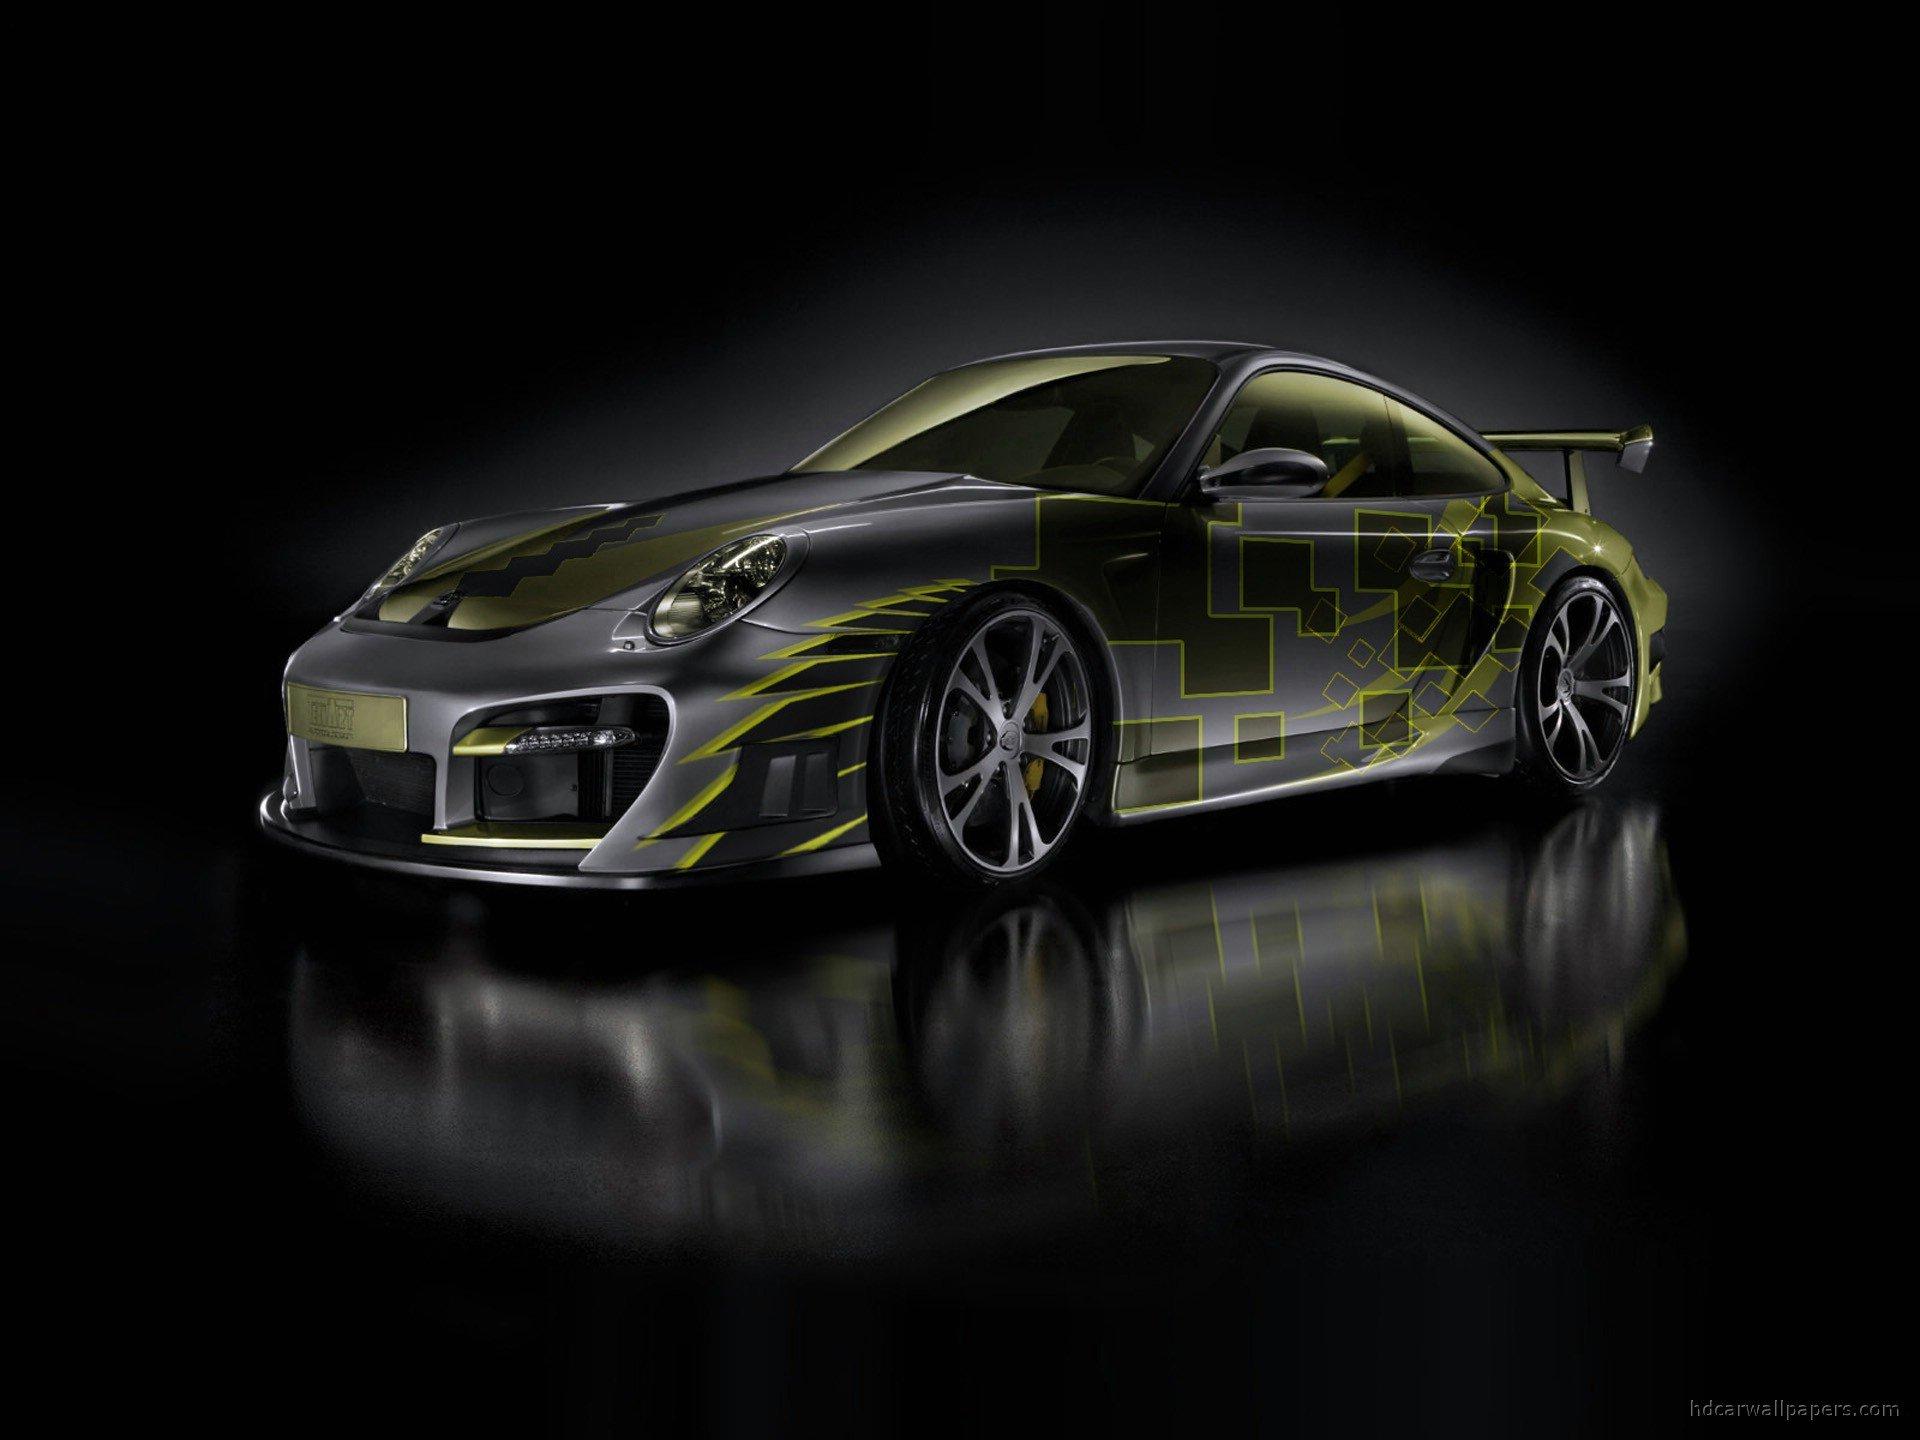 TechArt Porsche 911 Turbo Wallpapers | HD Wallpapers HTML code